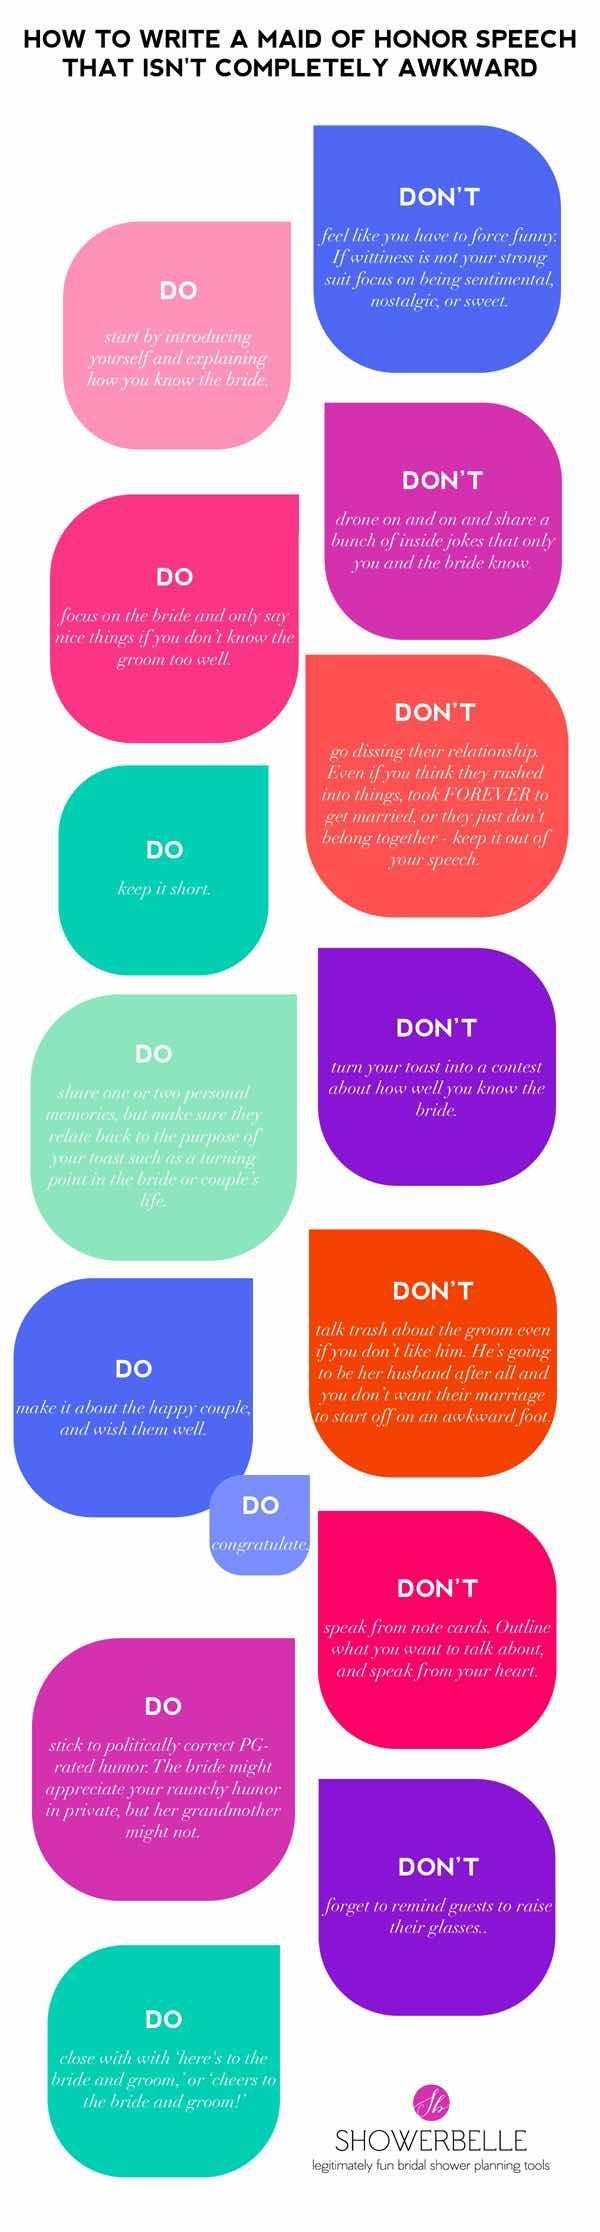 Wedding Planning: Maid Of Honor Duties Checklist - MODwedding